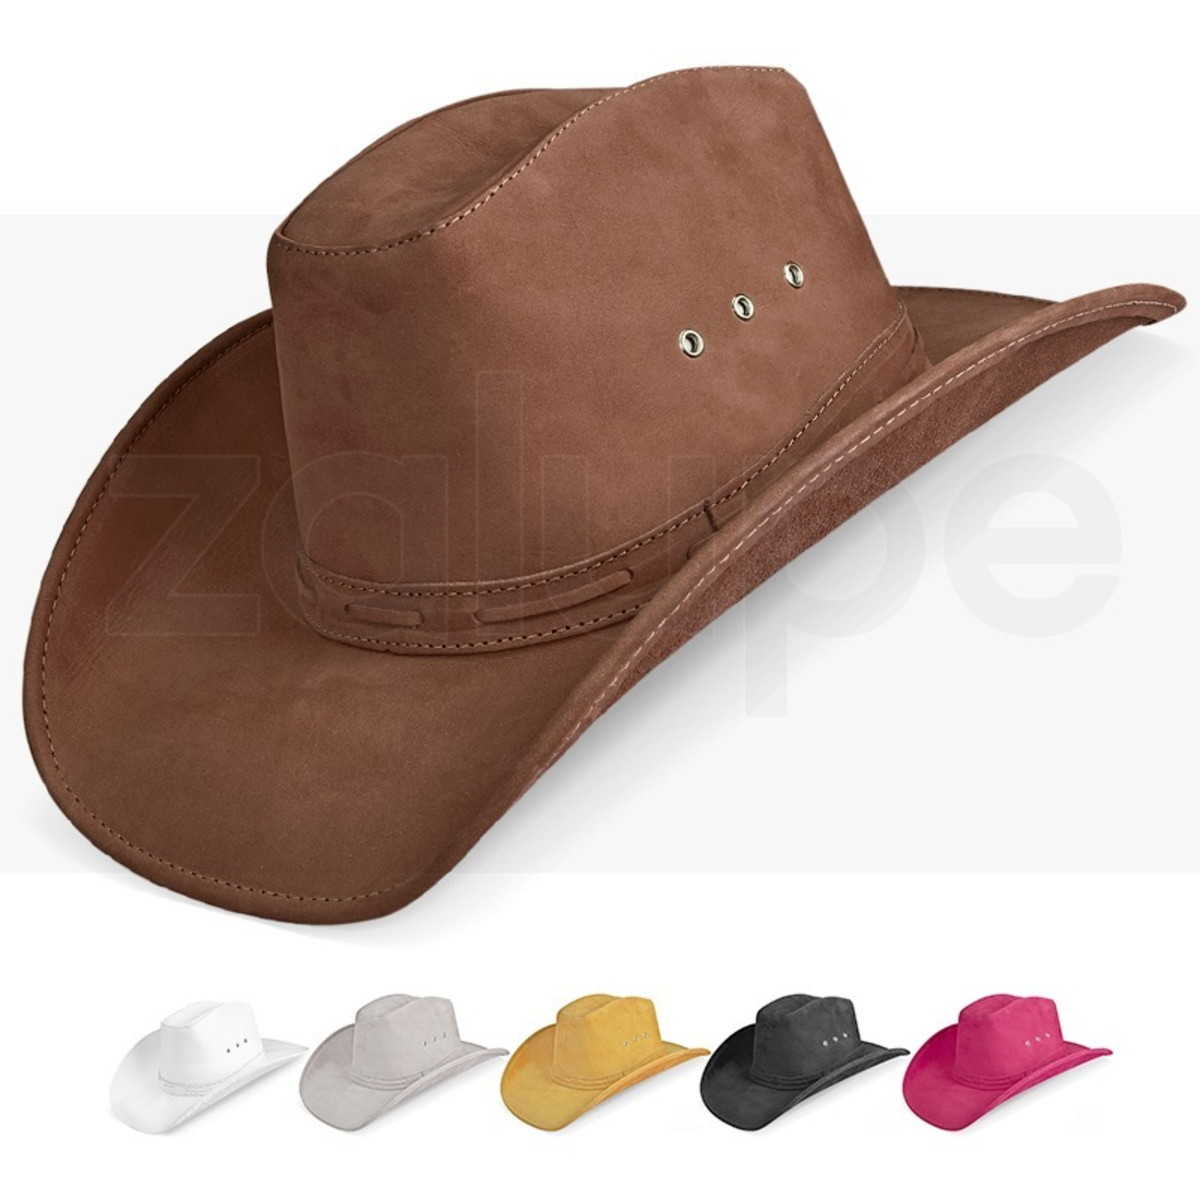 Chapeu Couro Masculino Country Texano Americano Rodeio Luxo no Elo7 ... 423d2acc42b